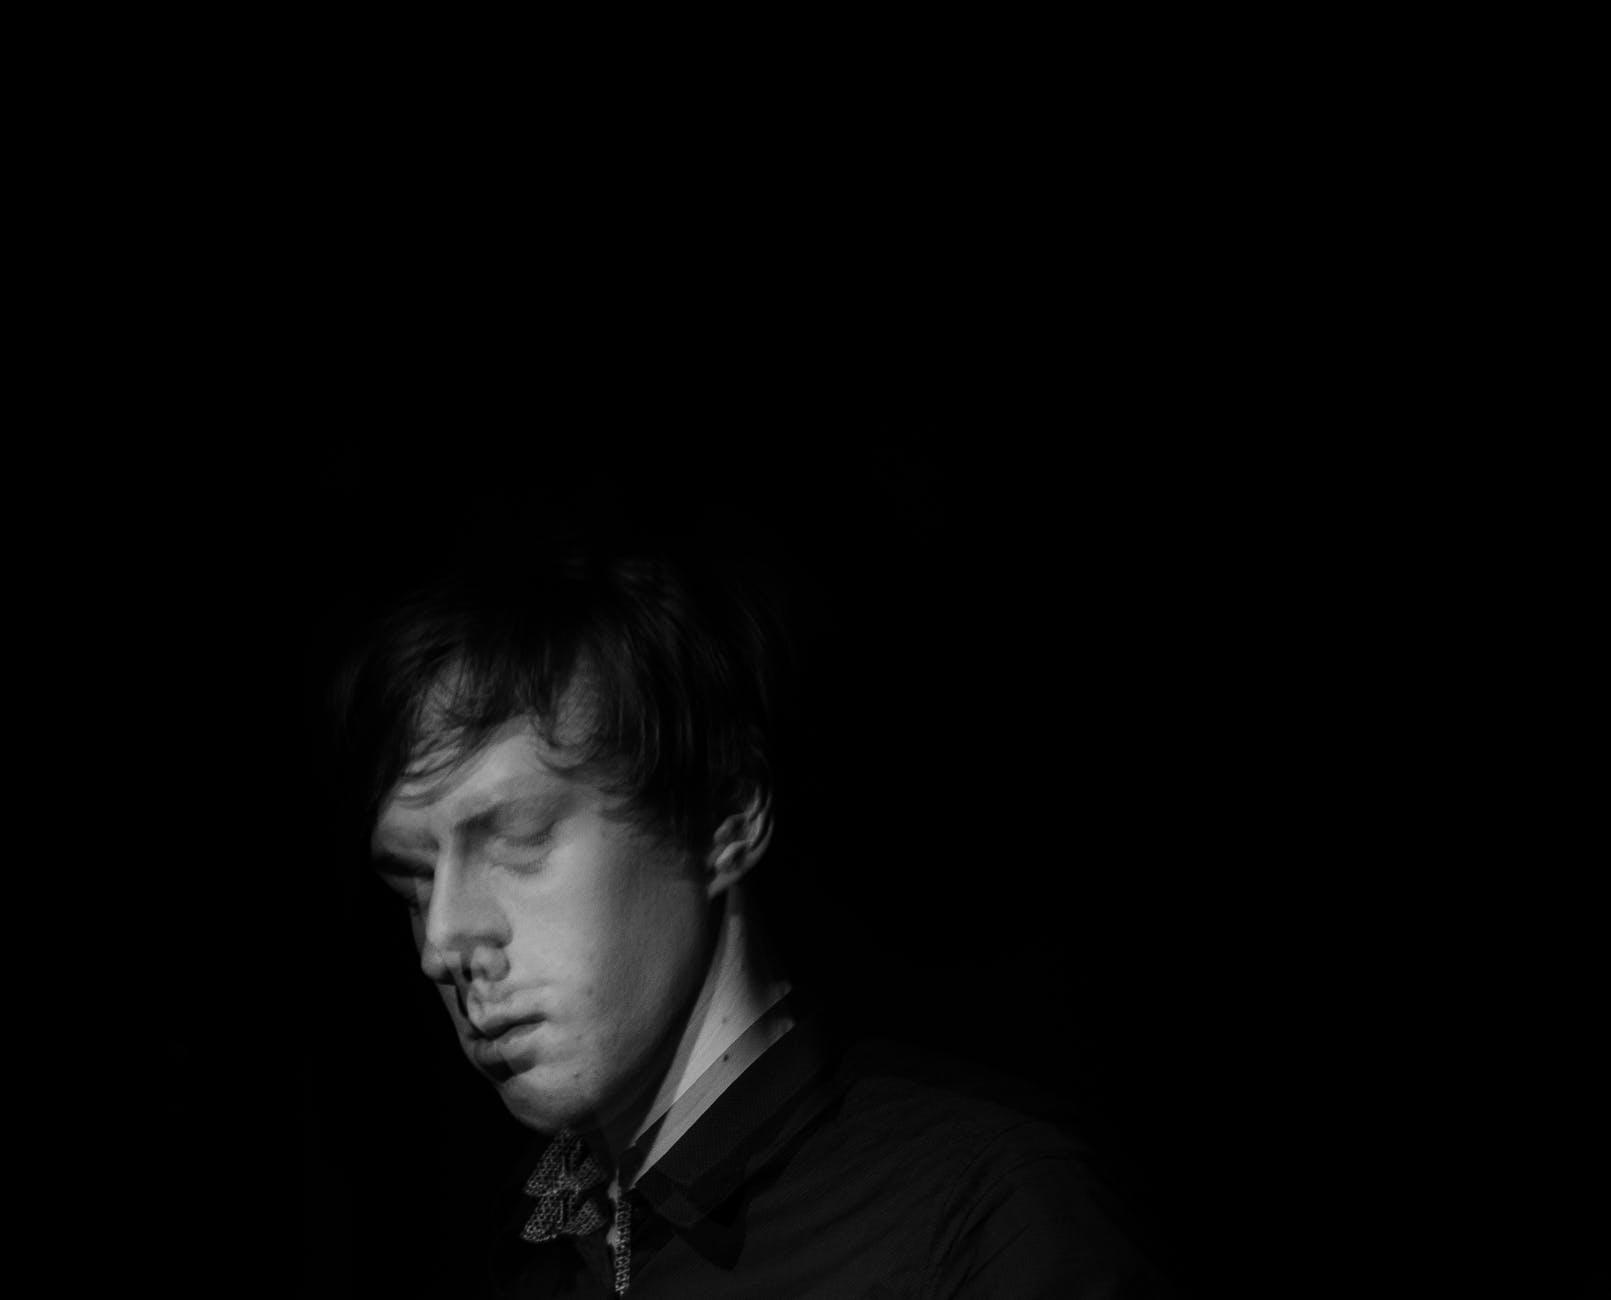 Blurred man in black shirt